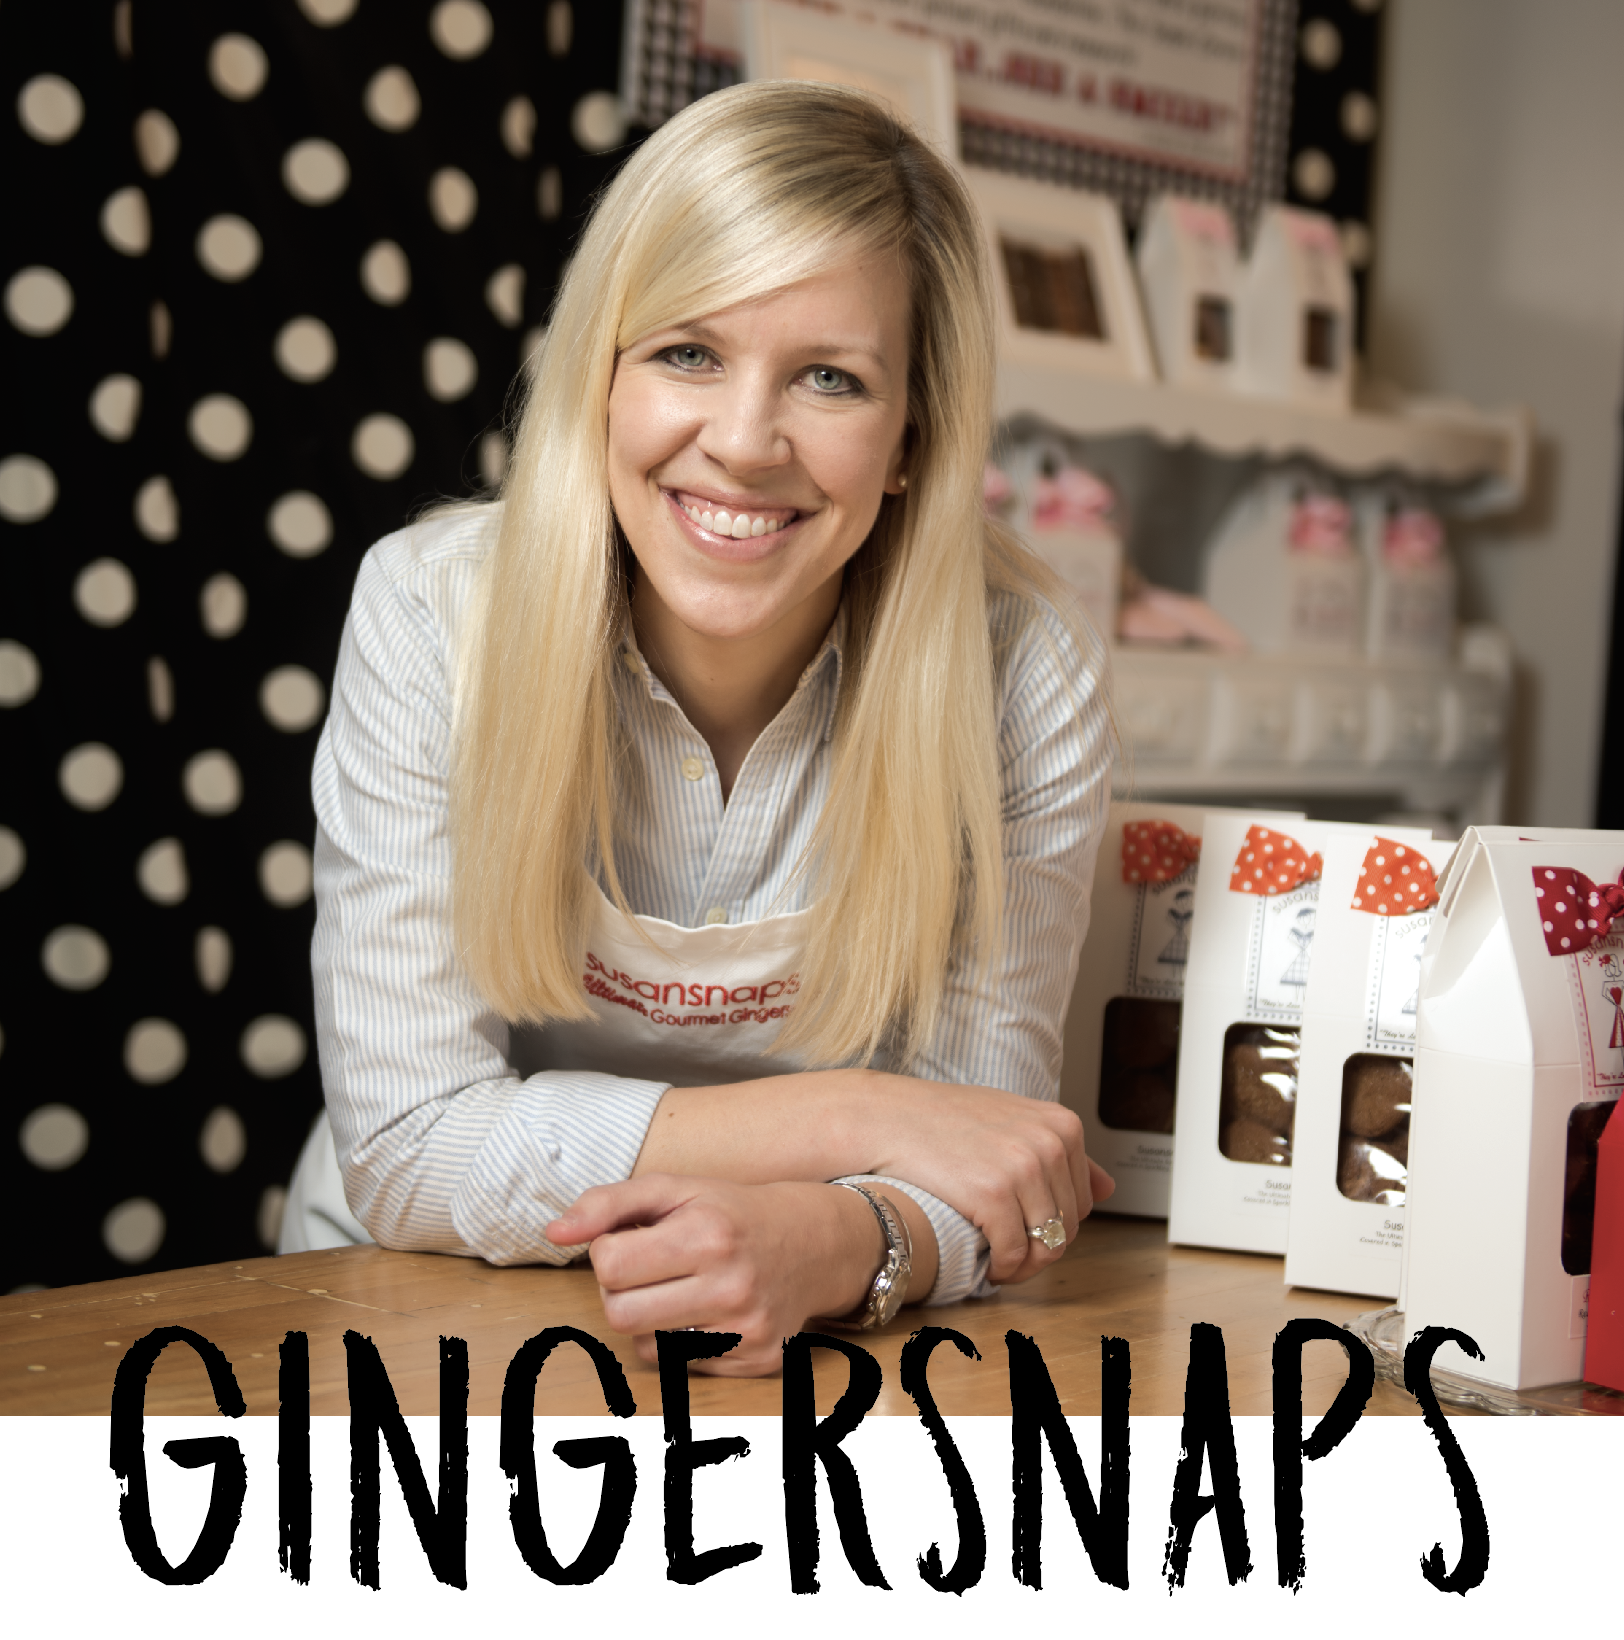 Gingersnaps; Susan Stachler